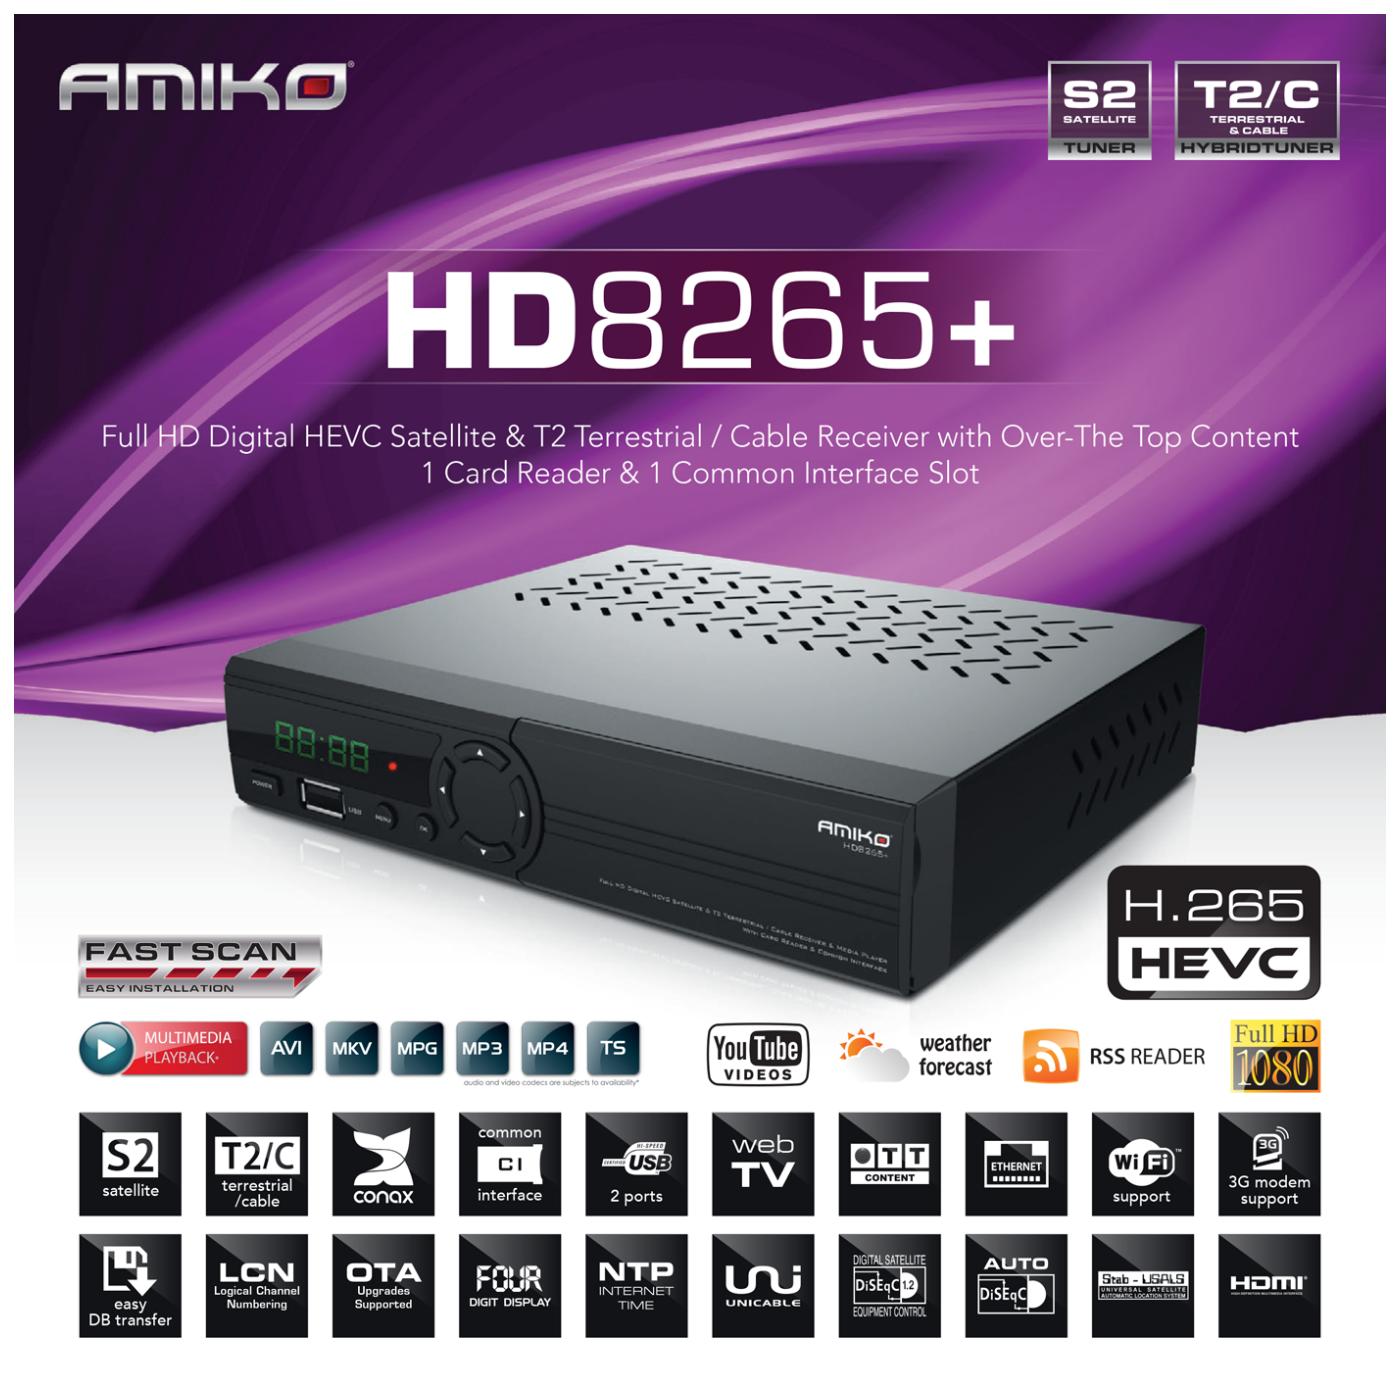 HD-8265+